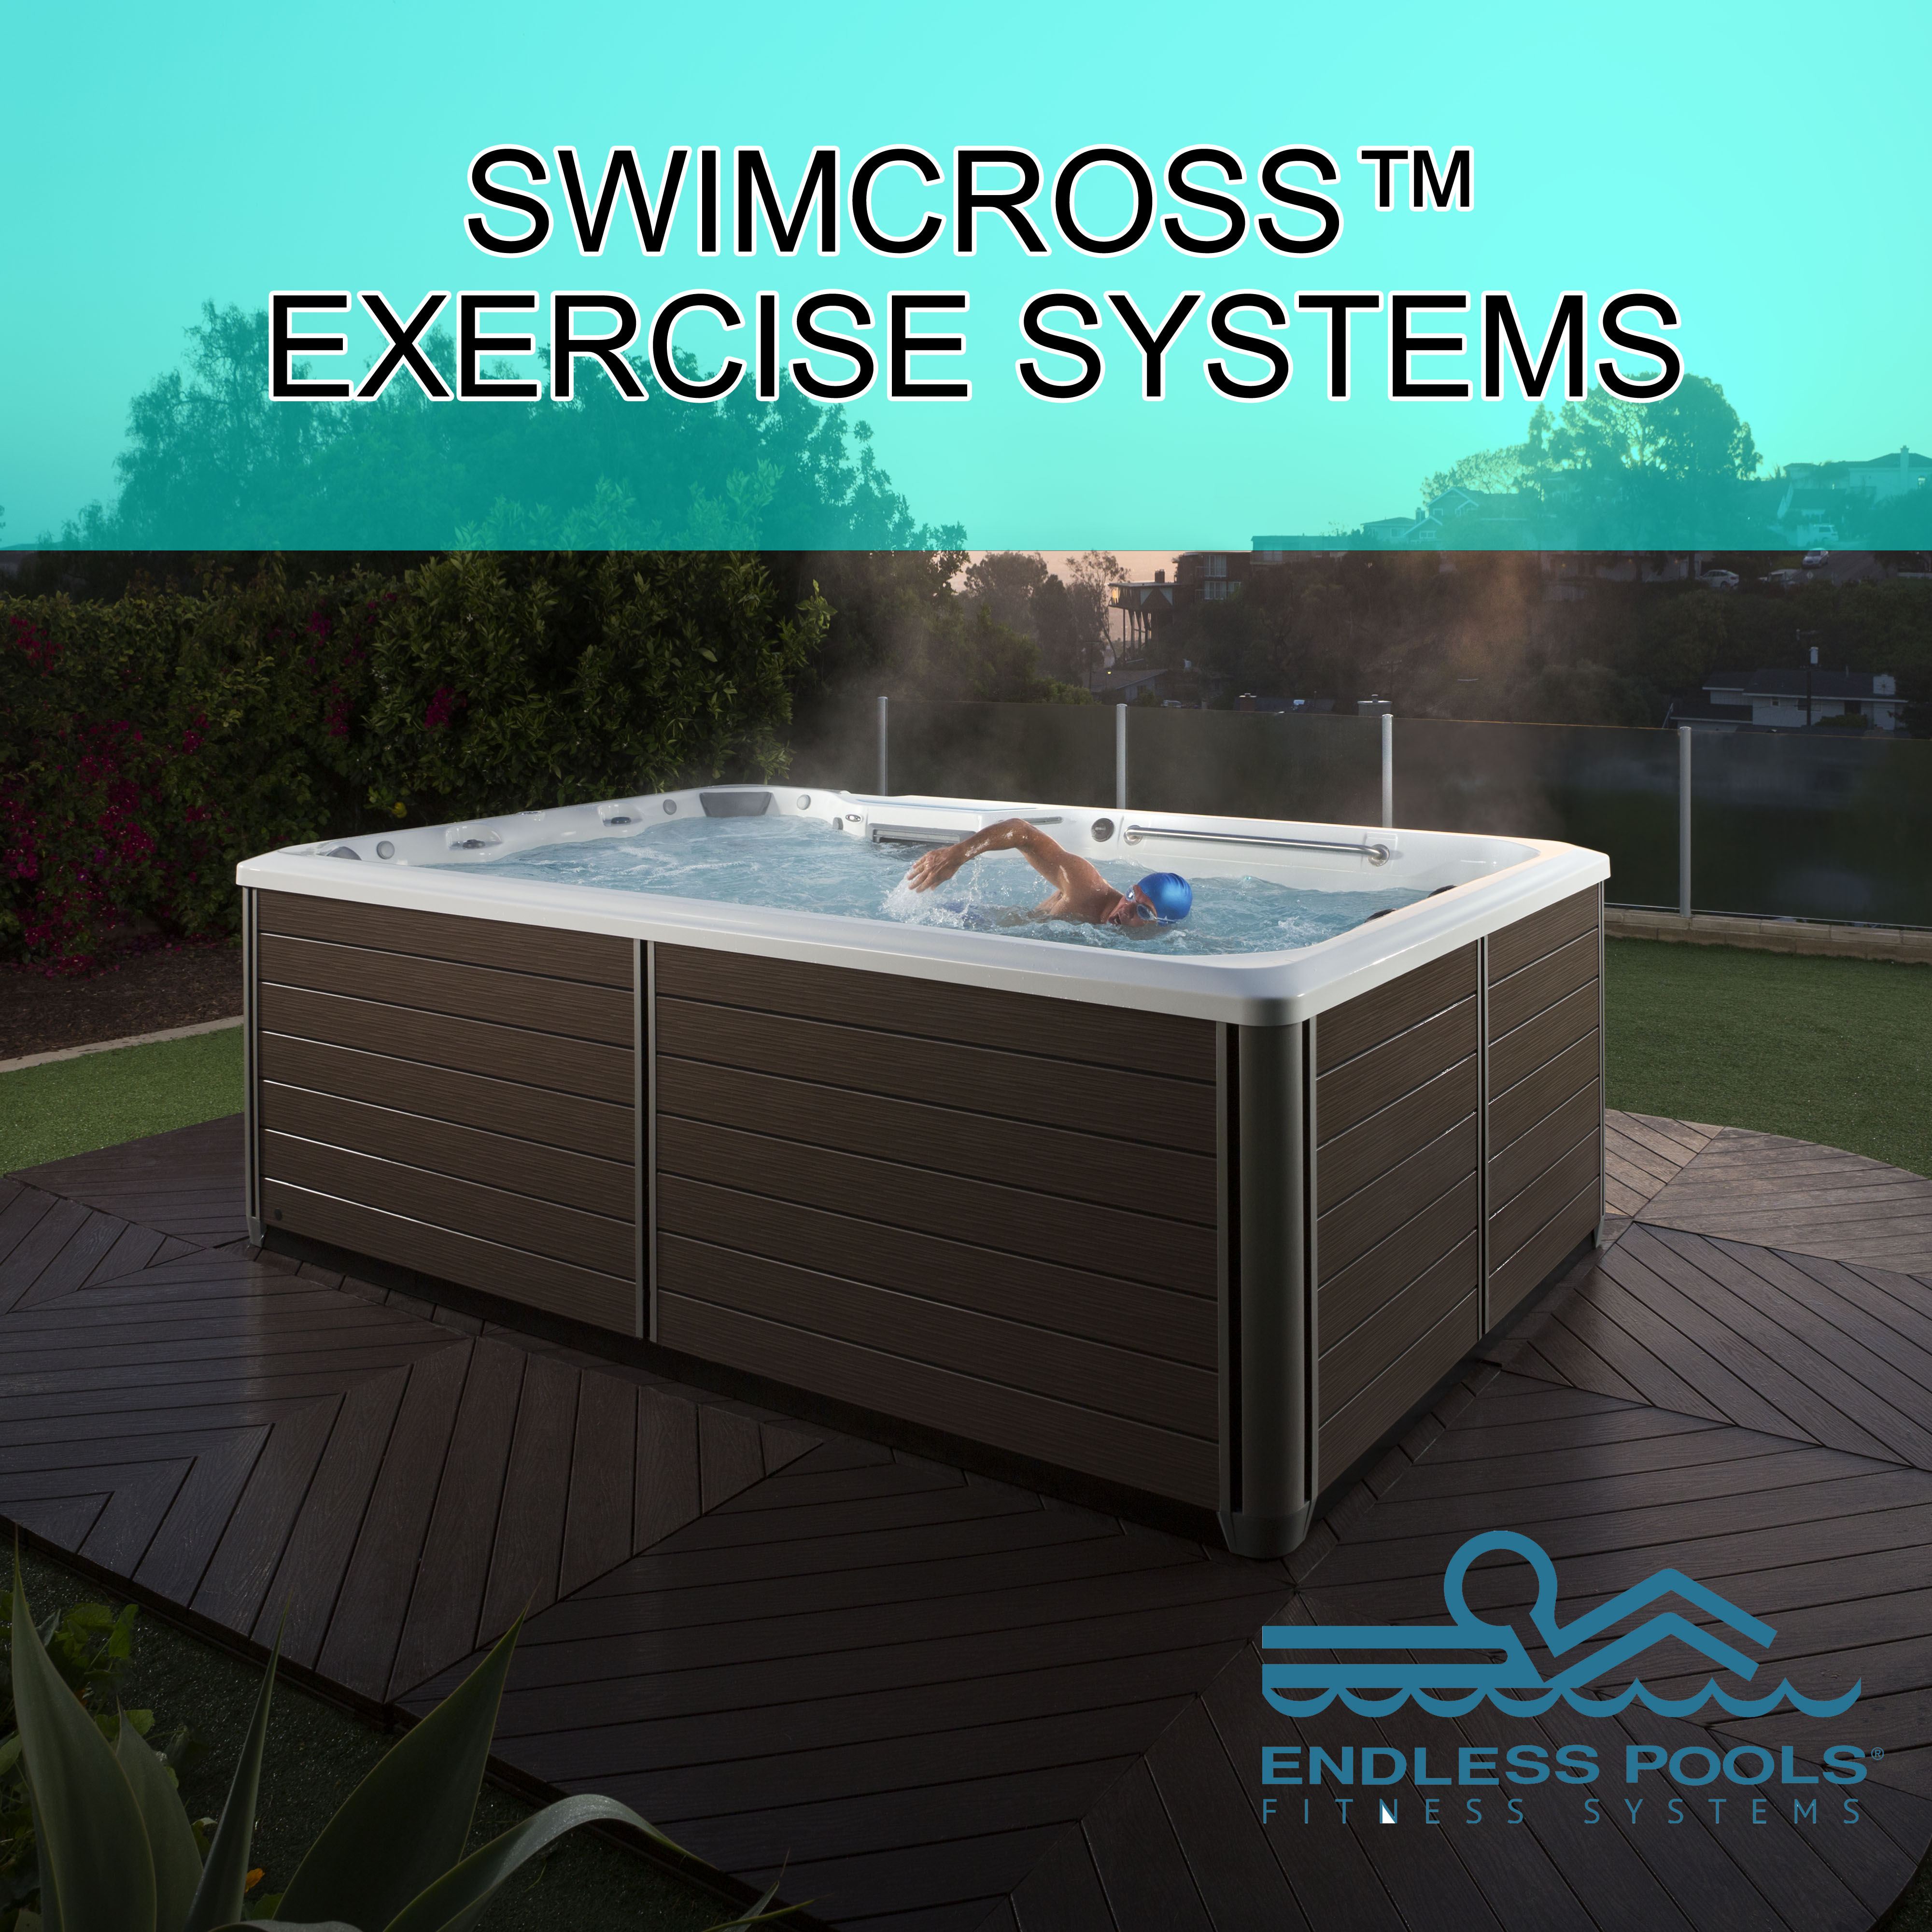 Swimcross Endless pool